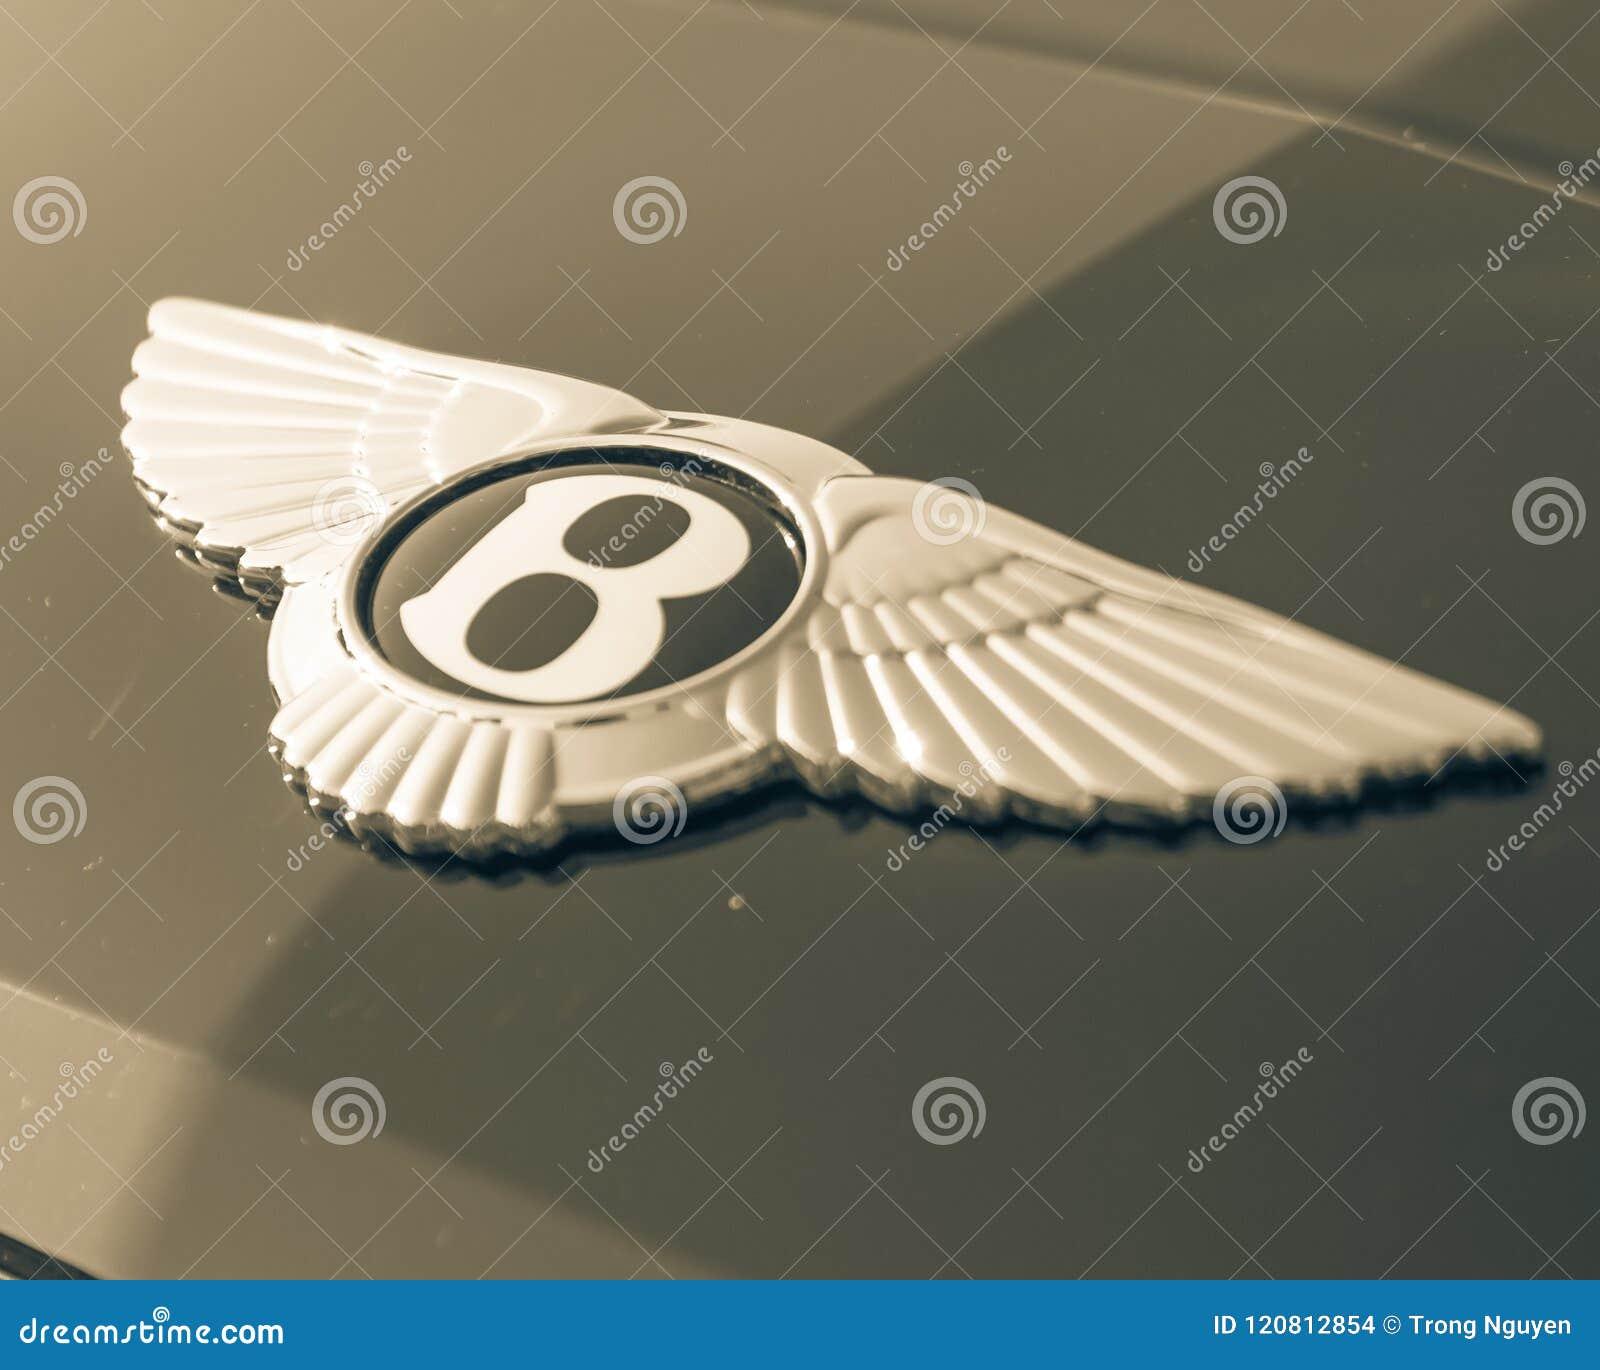 Vintage Tone Logo Of Bentley Luxury Car Brand Editorial Stock Image